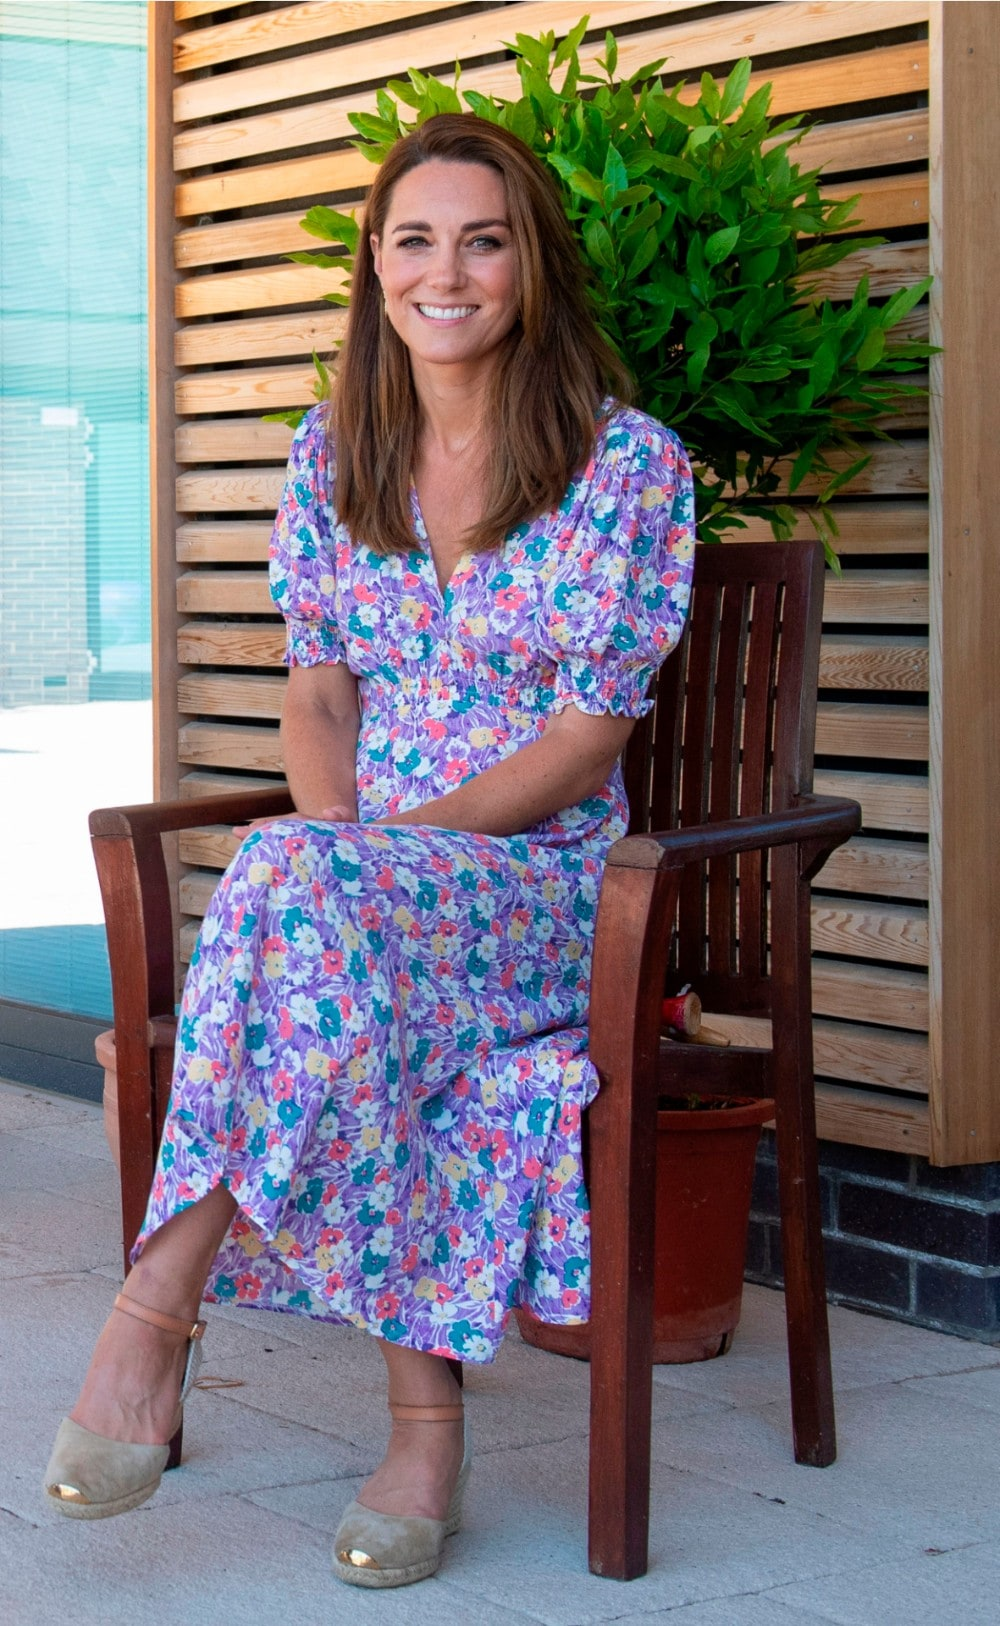 kate floral dress 1